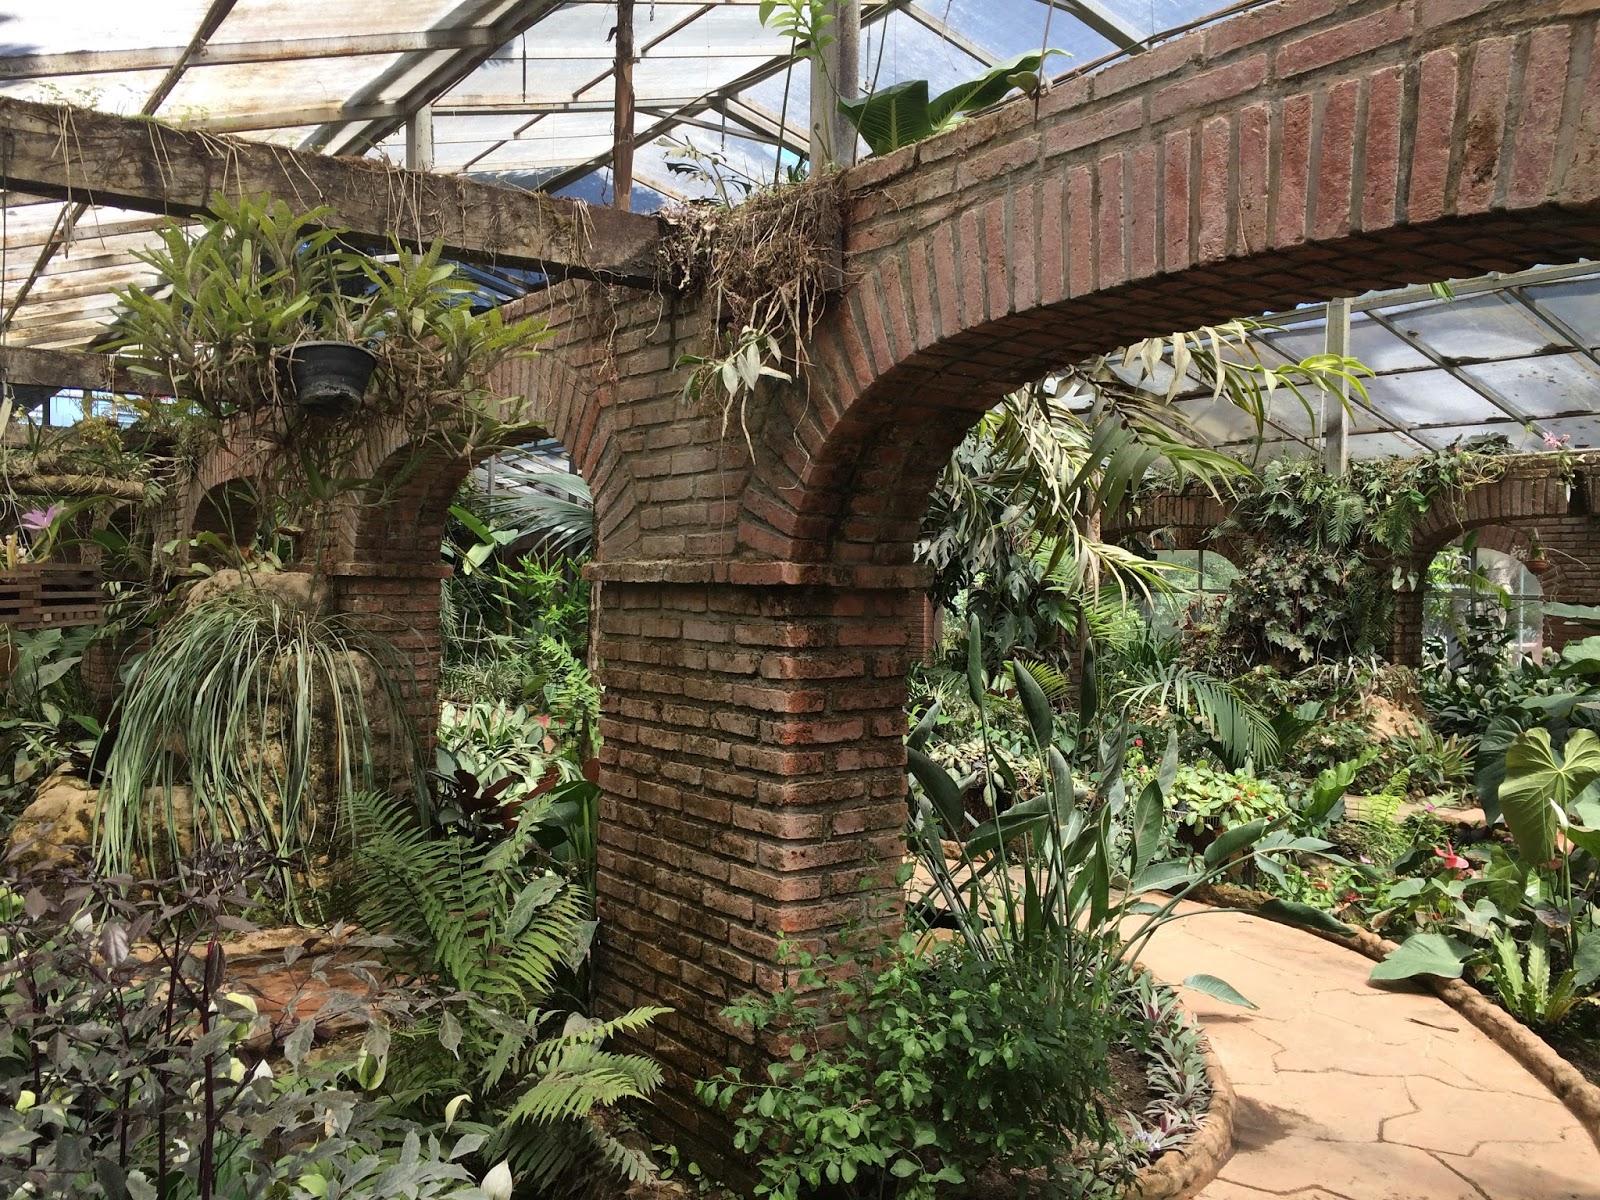 Neuve meses en cochabamba for Jardin botanico nocturno 2016